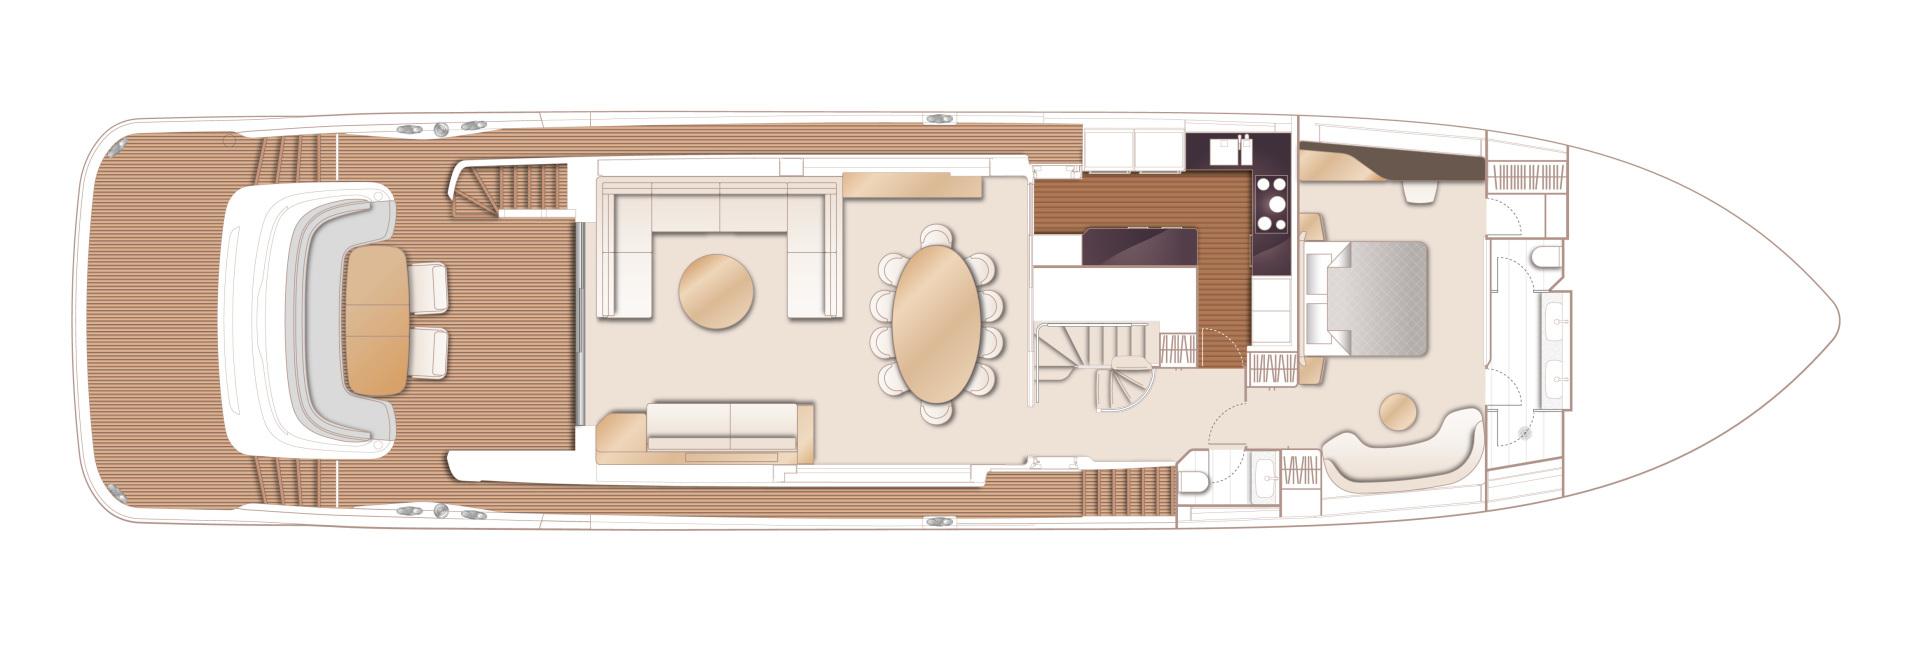 Princess-95 Motor Yacht 2022-Y95 Unknown-Florida-United States-1582781 | Thumbnail